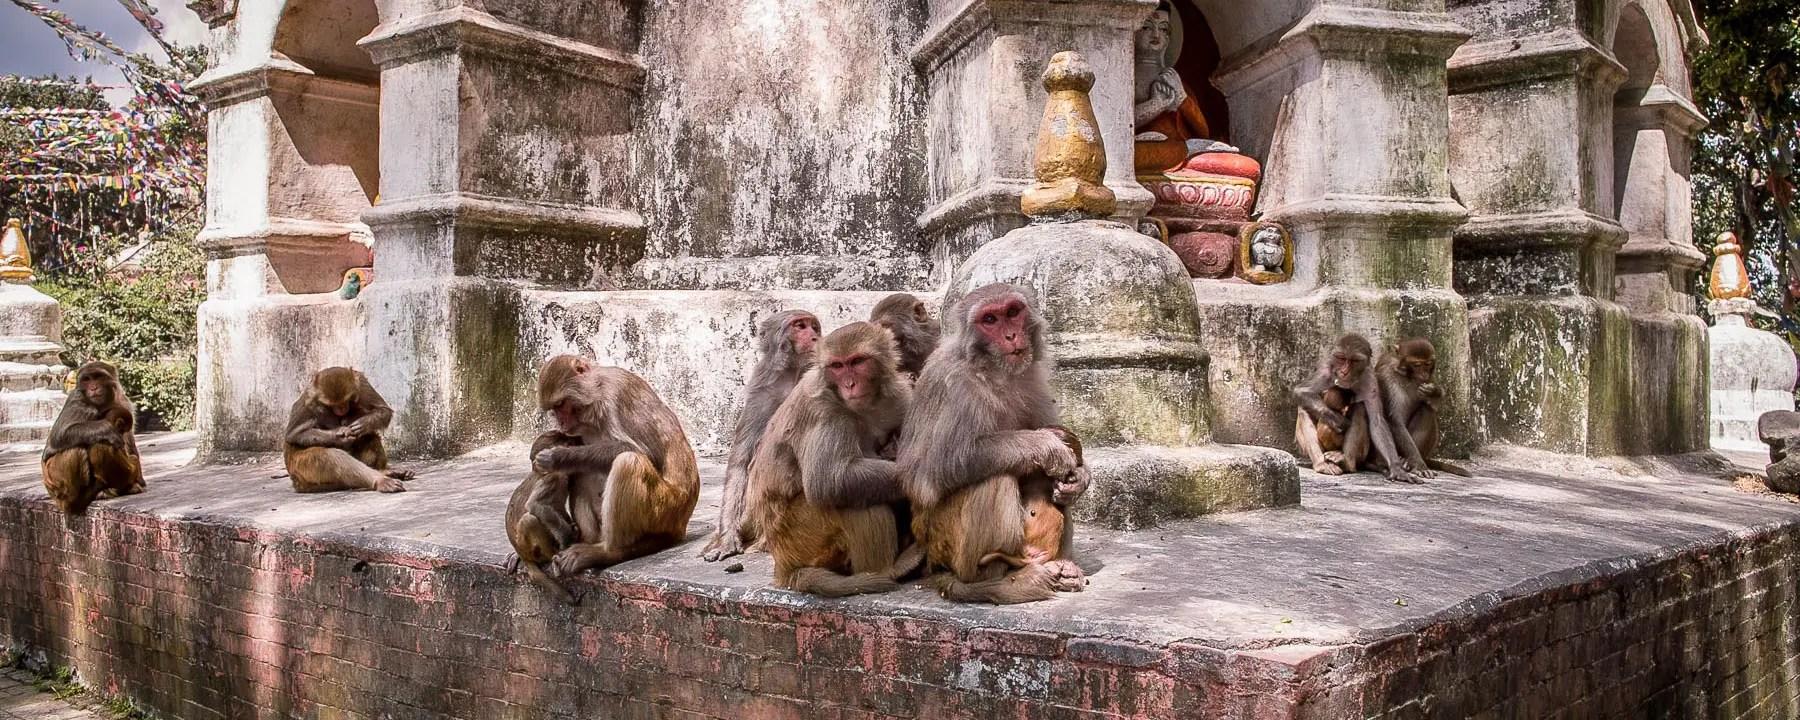 Monkeys Temple KathmanduMonkeys Temple Kathmandu